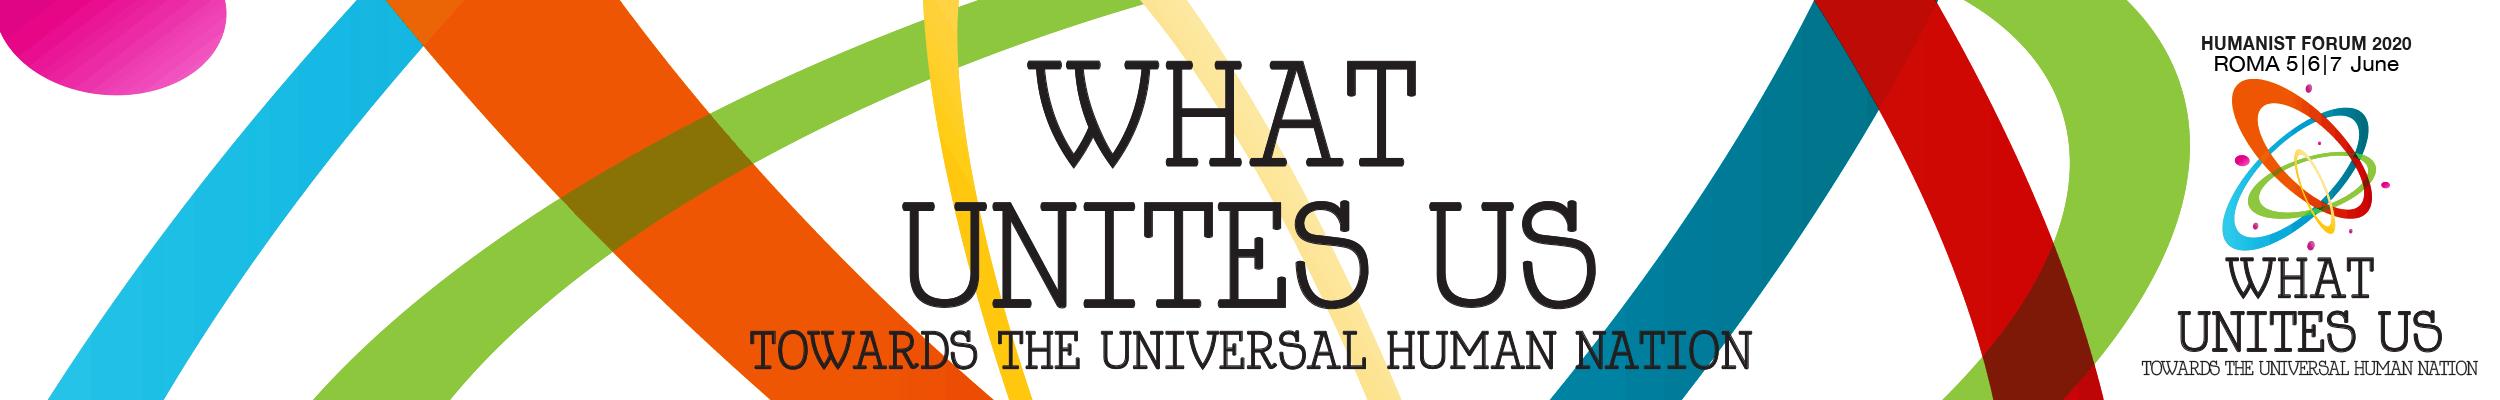 Humanist Forum